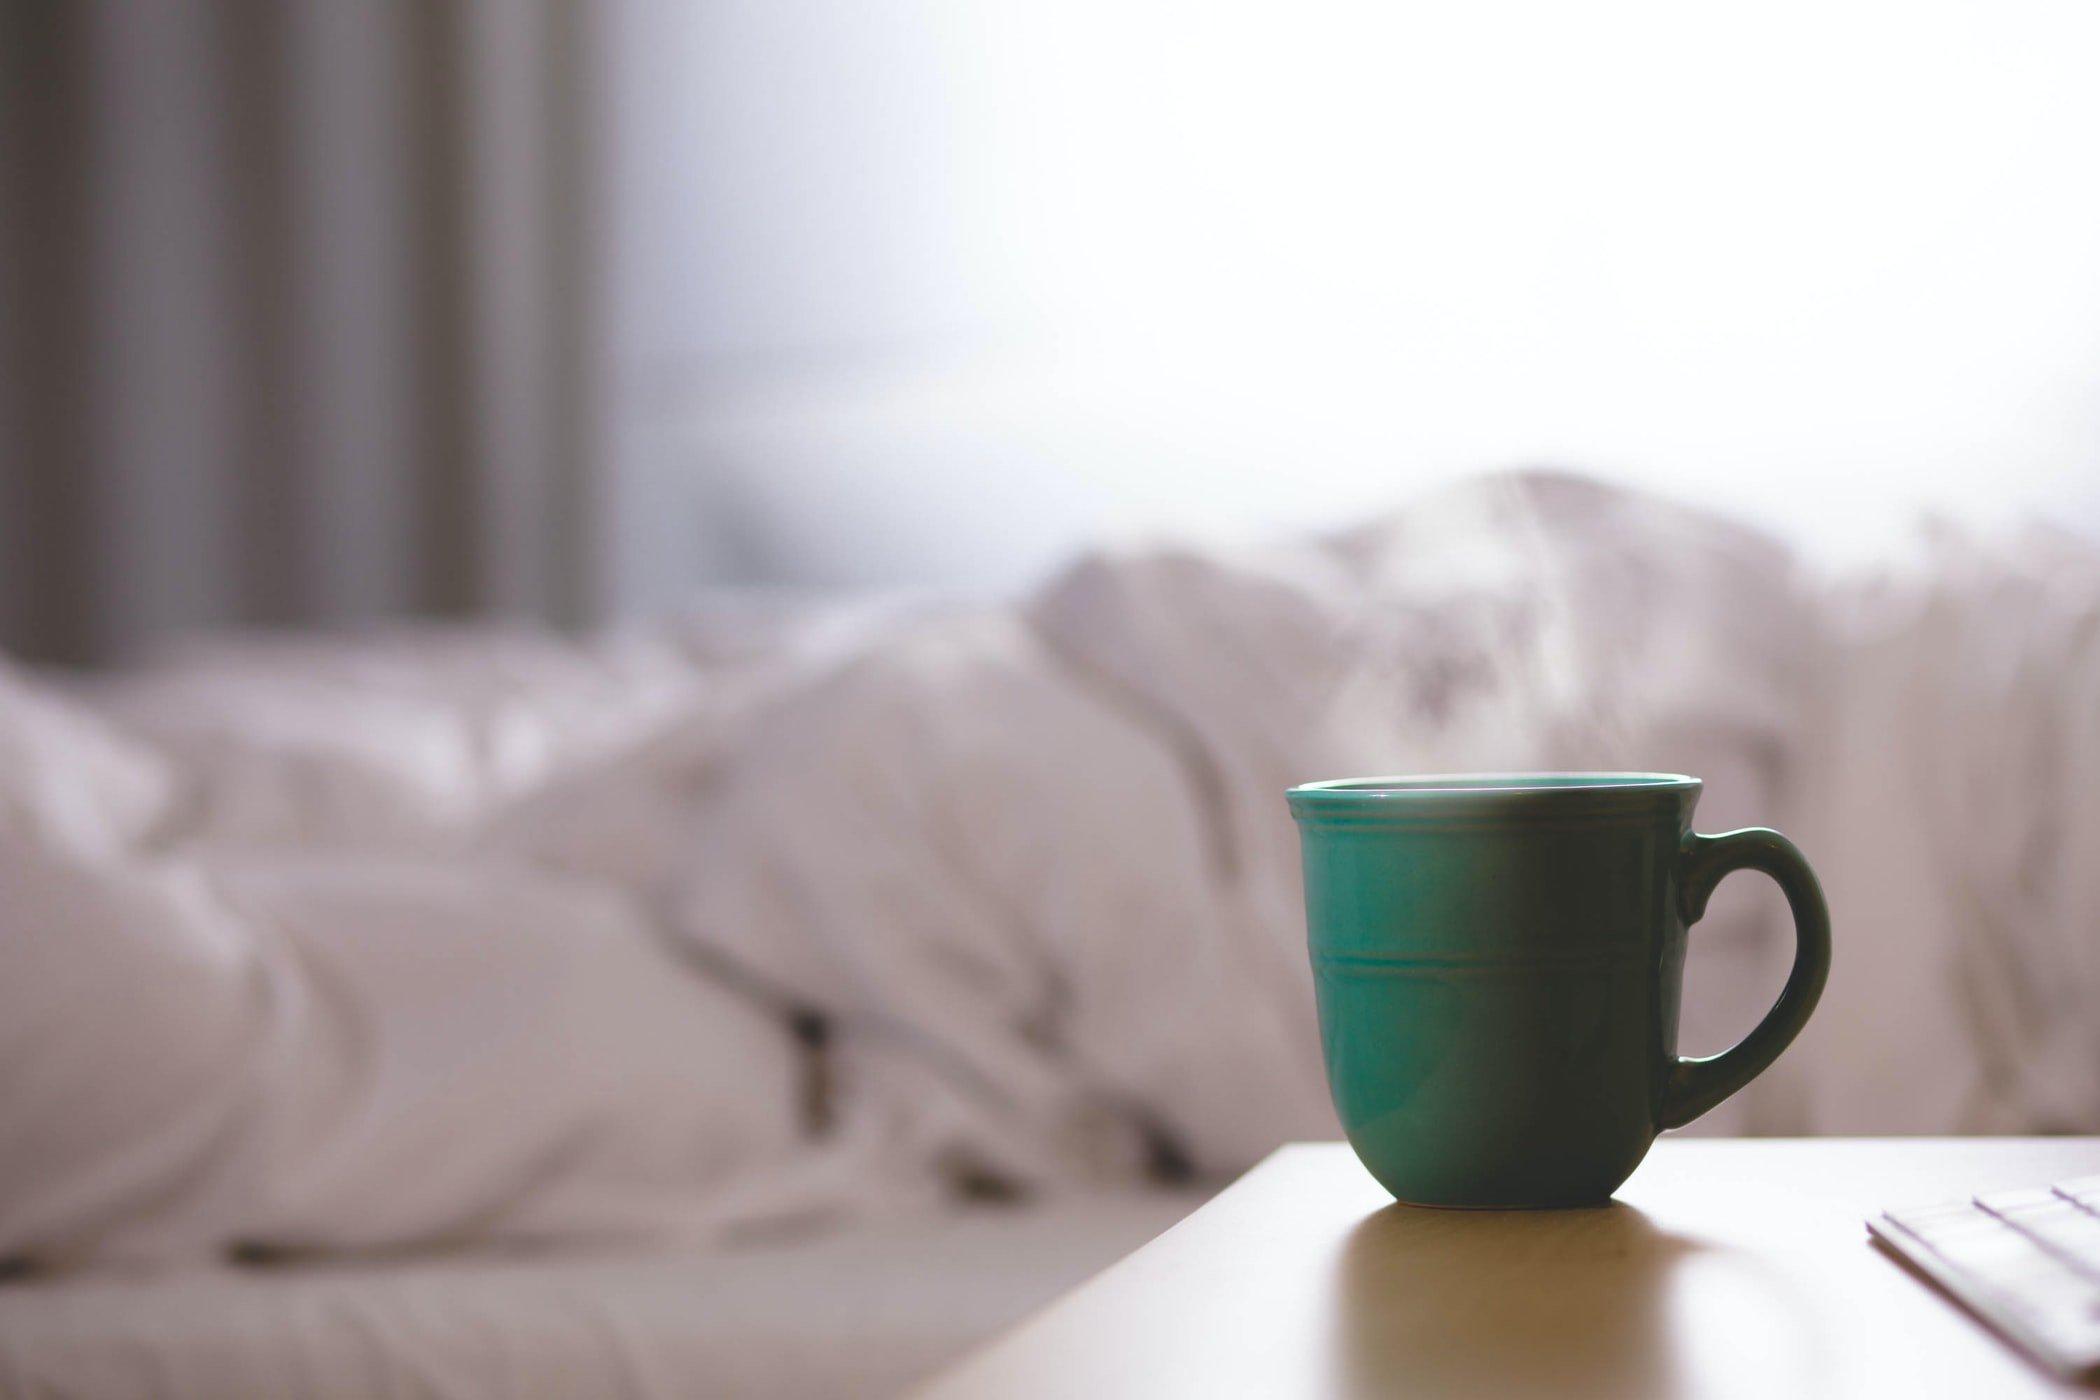 A mug by a bed